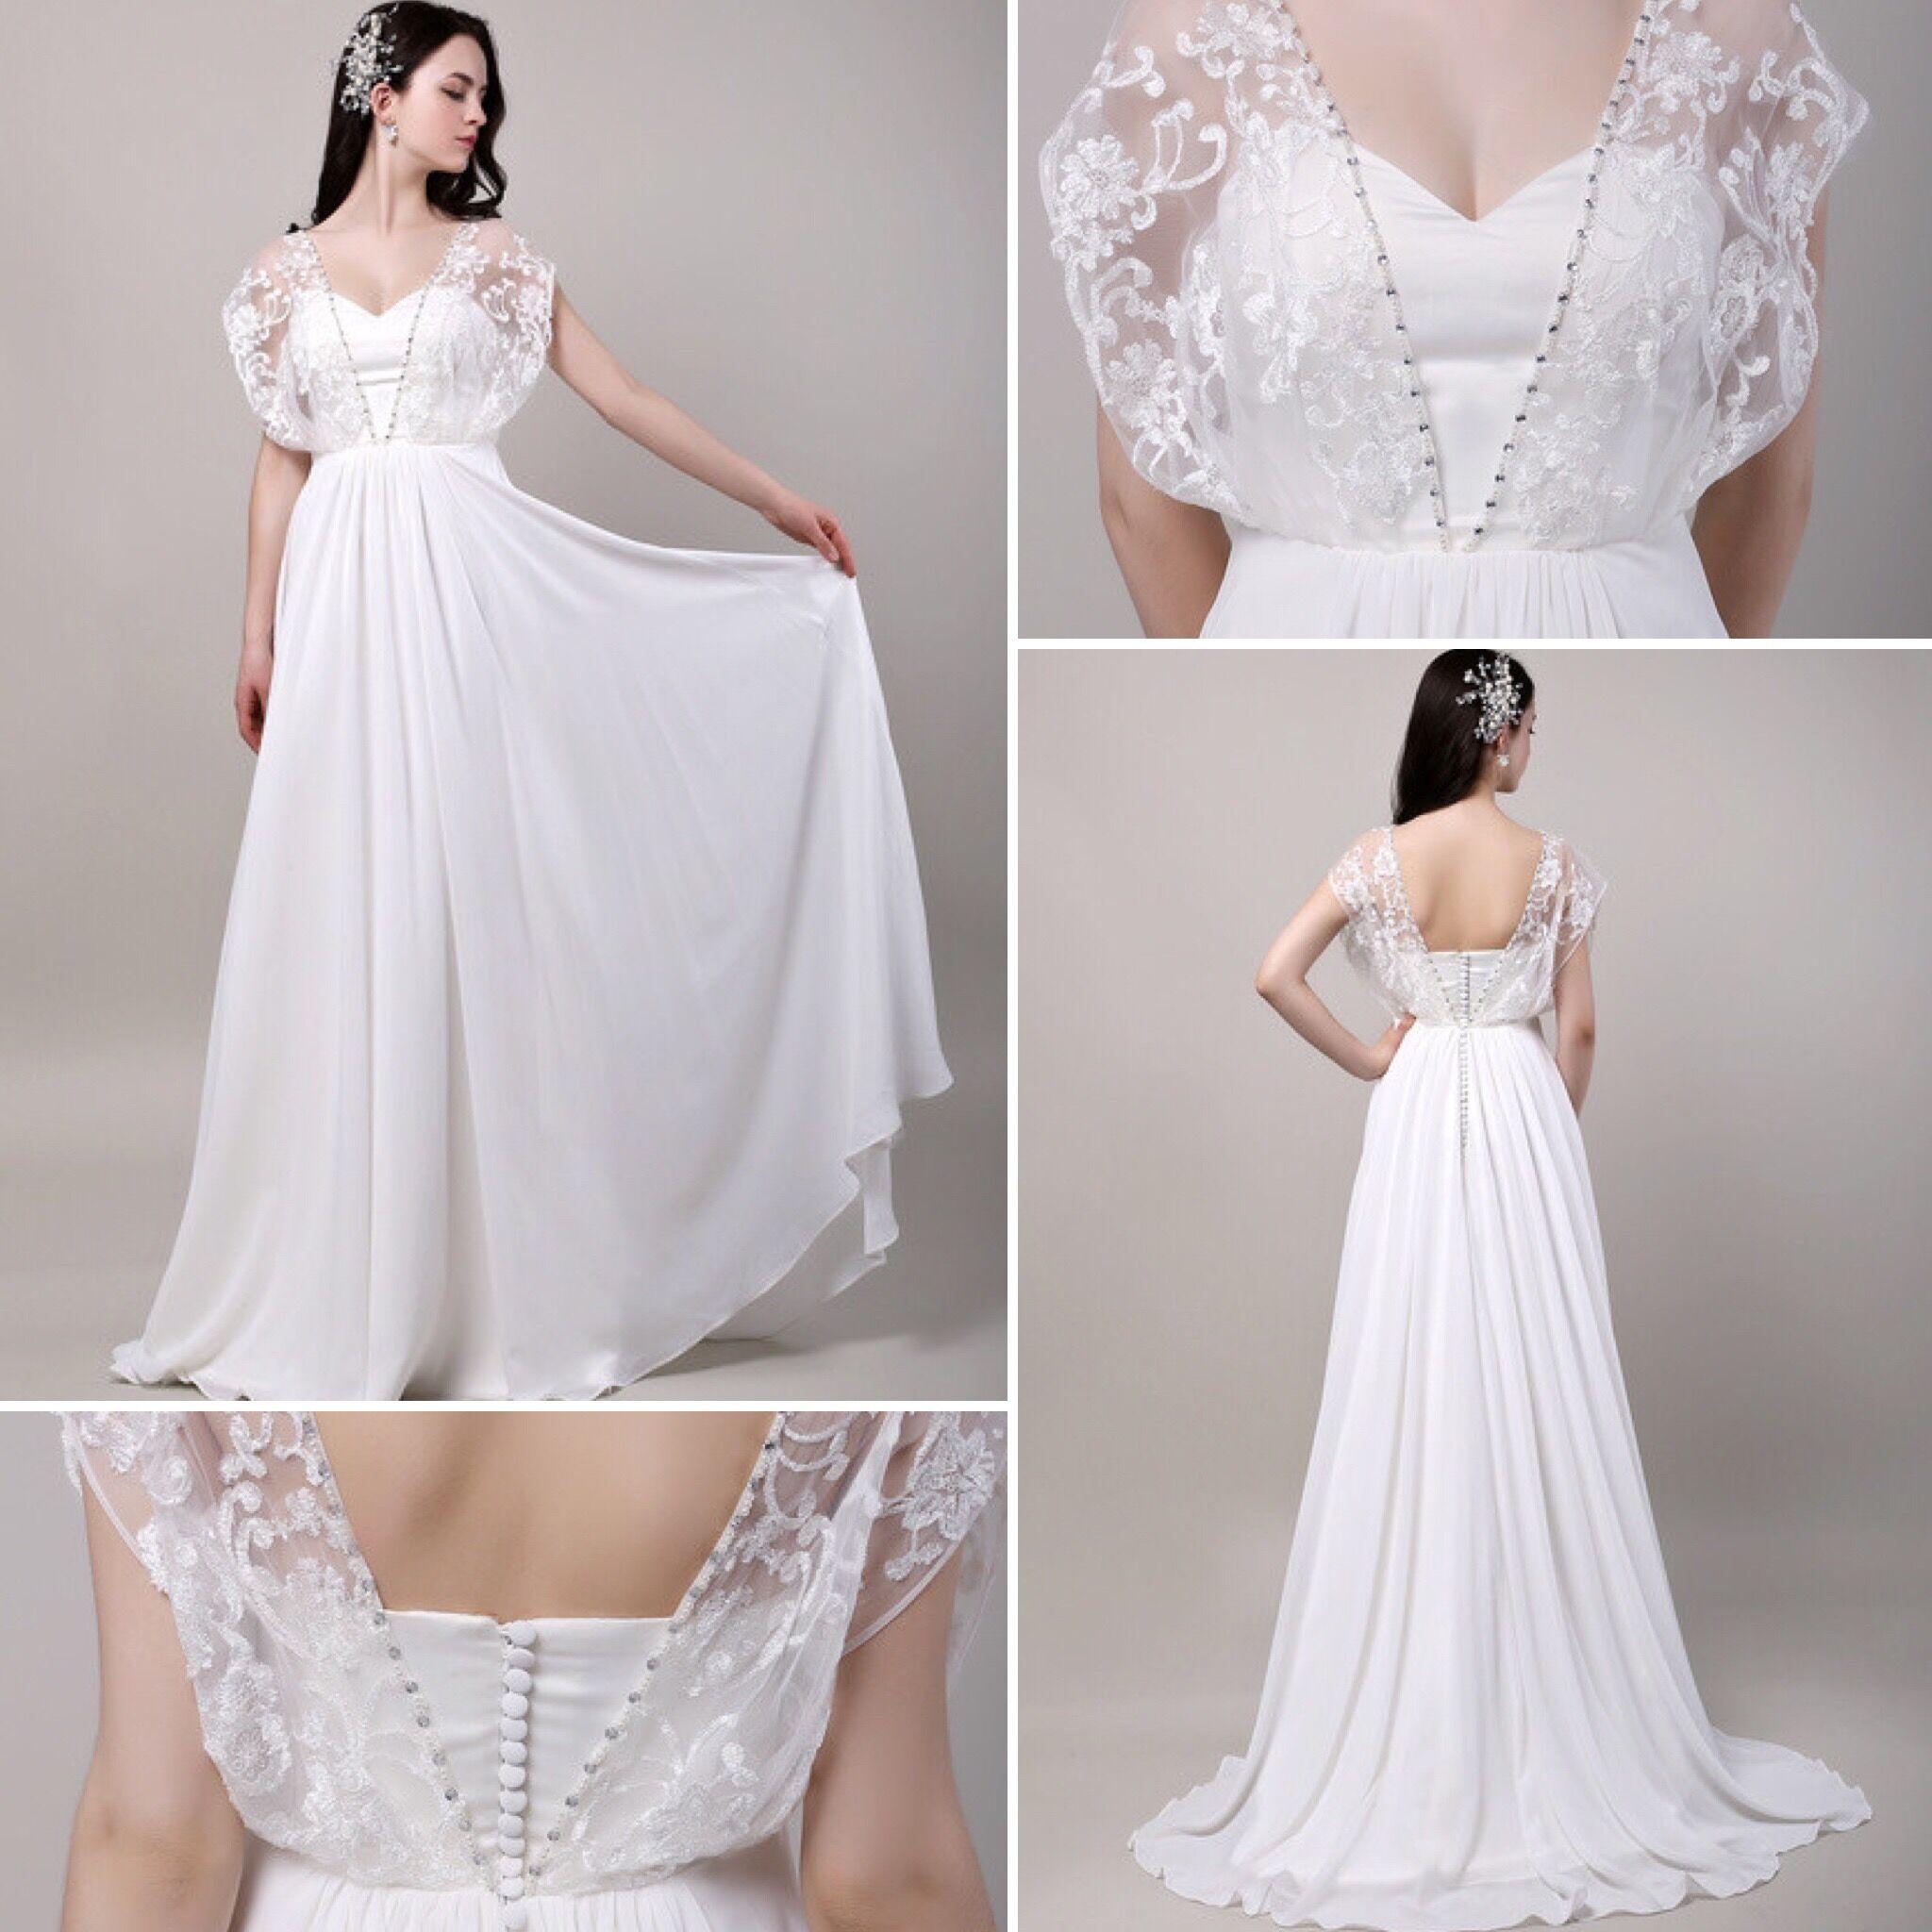 Civil Wedding Ideas: Boho Wedding Dress Sweatheart Butterfly Lace Sleeves